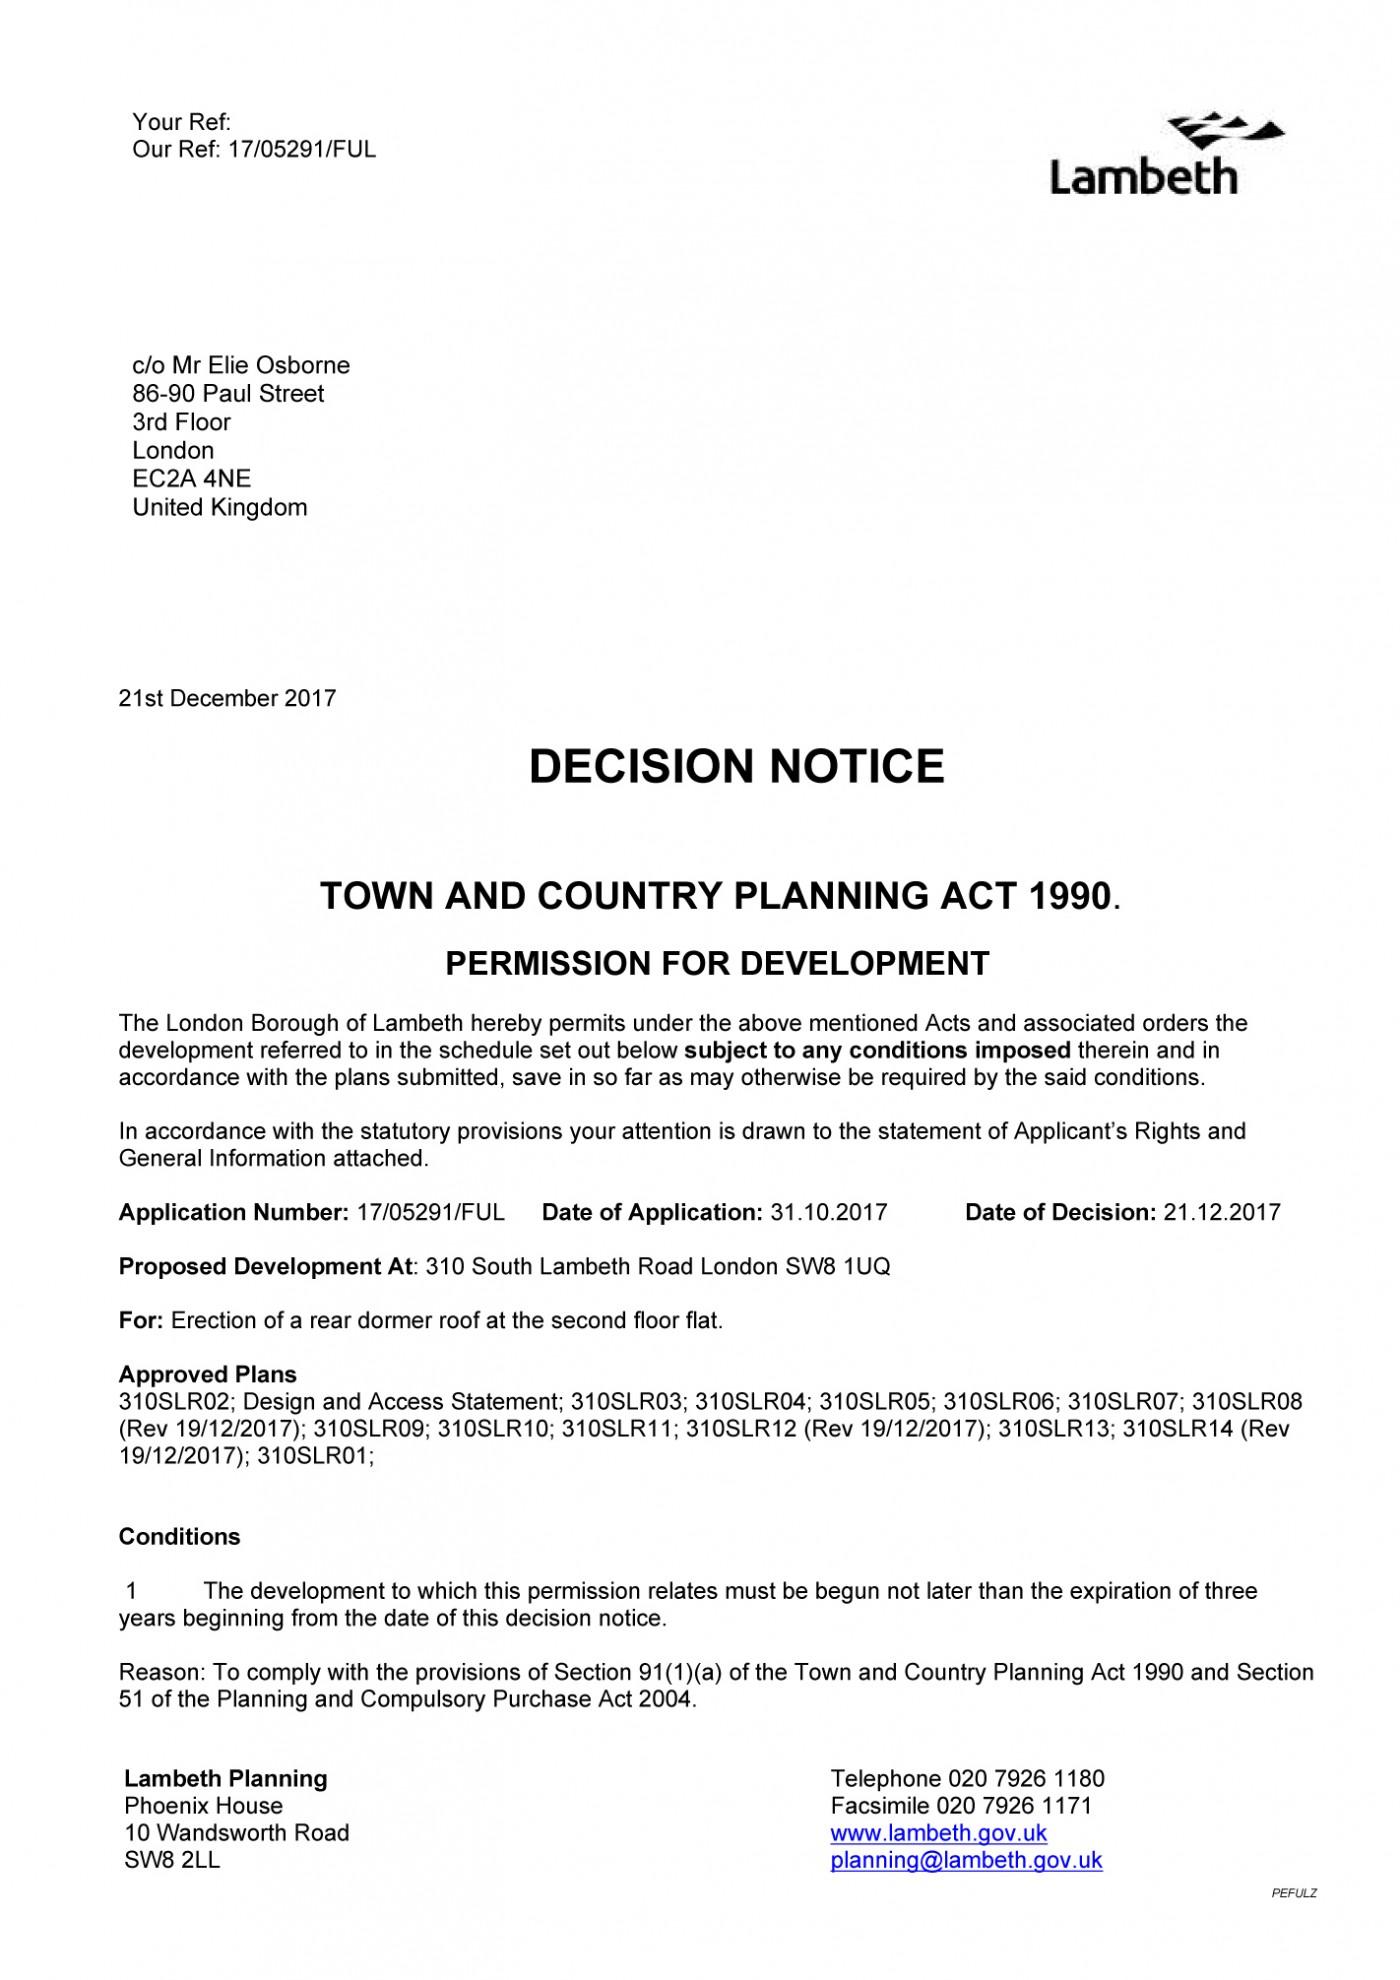 decision notice - Lambeth Council